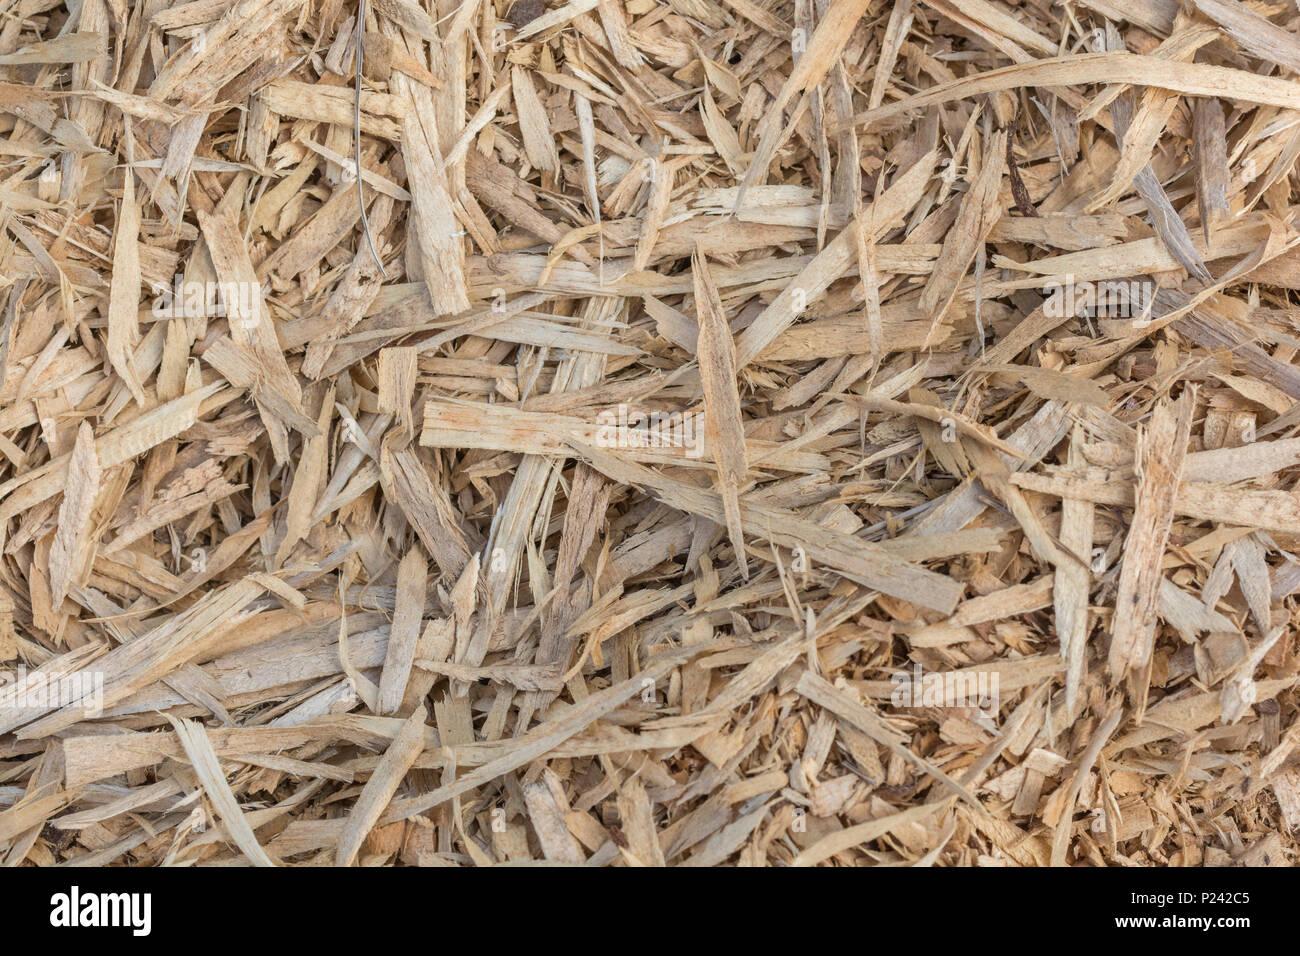 Needle haystack stock photos